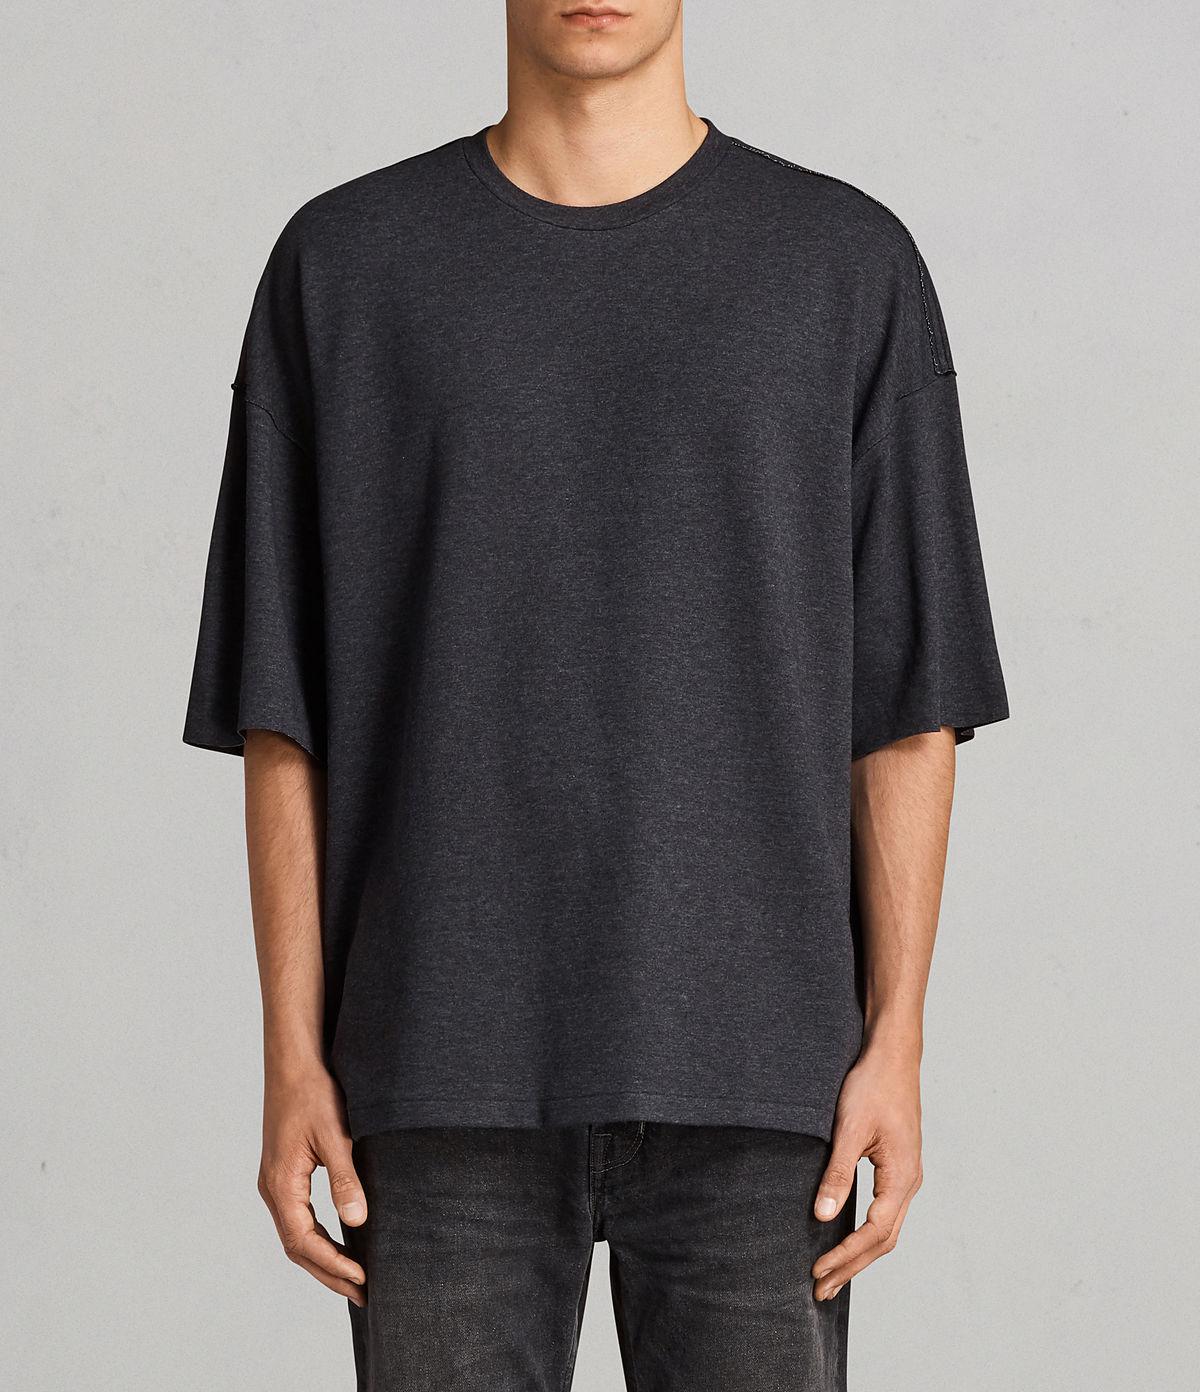 torny-short-sleeve-crew-sweatshirt